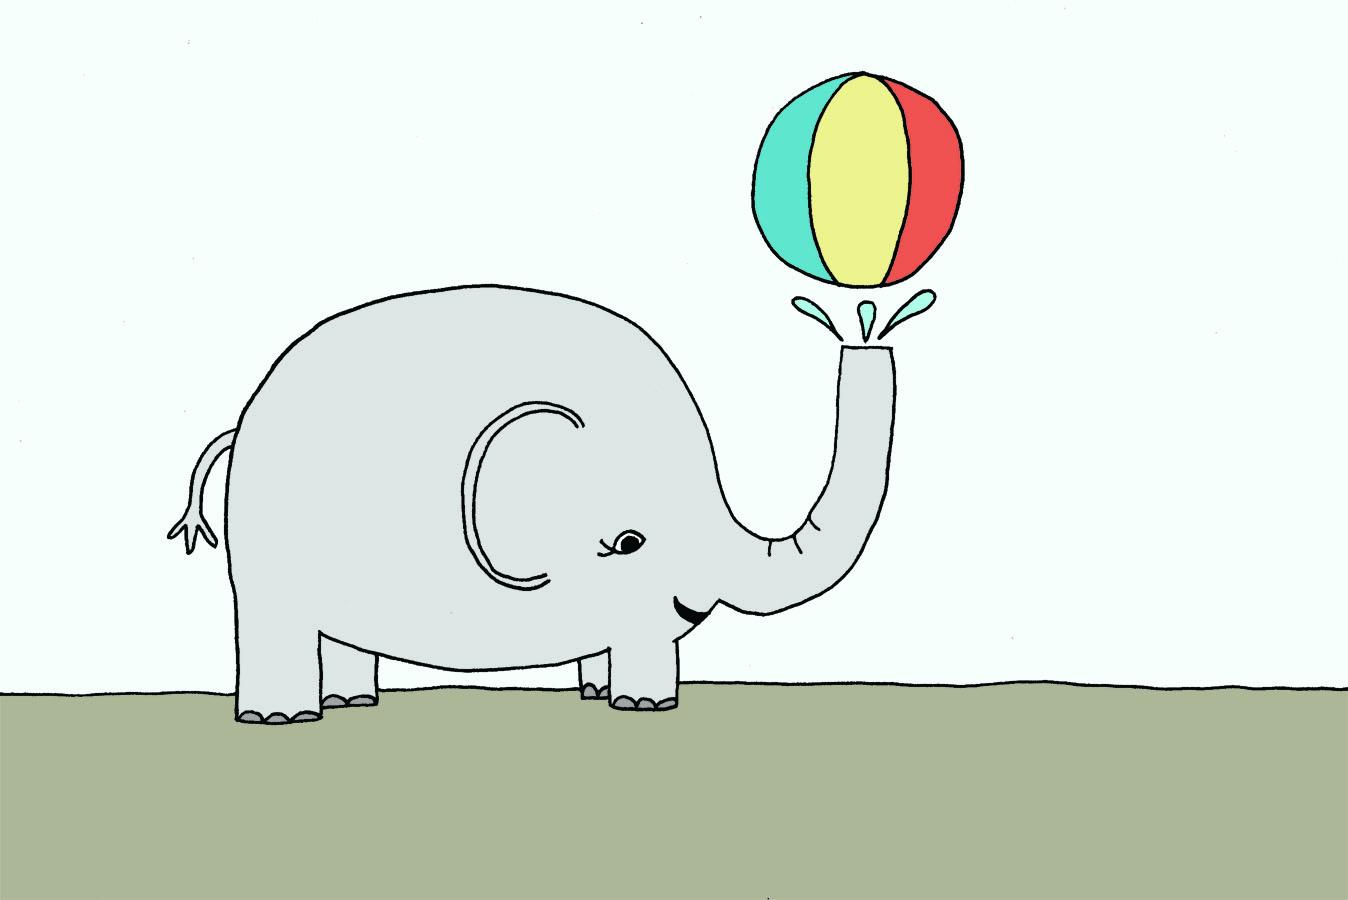 elephant_ball.jpg